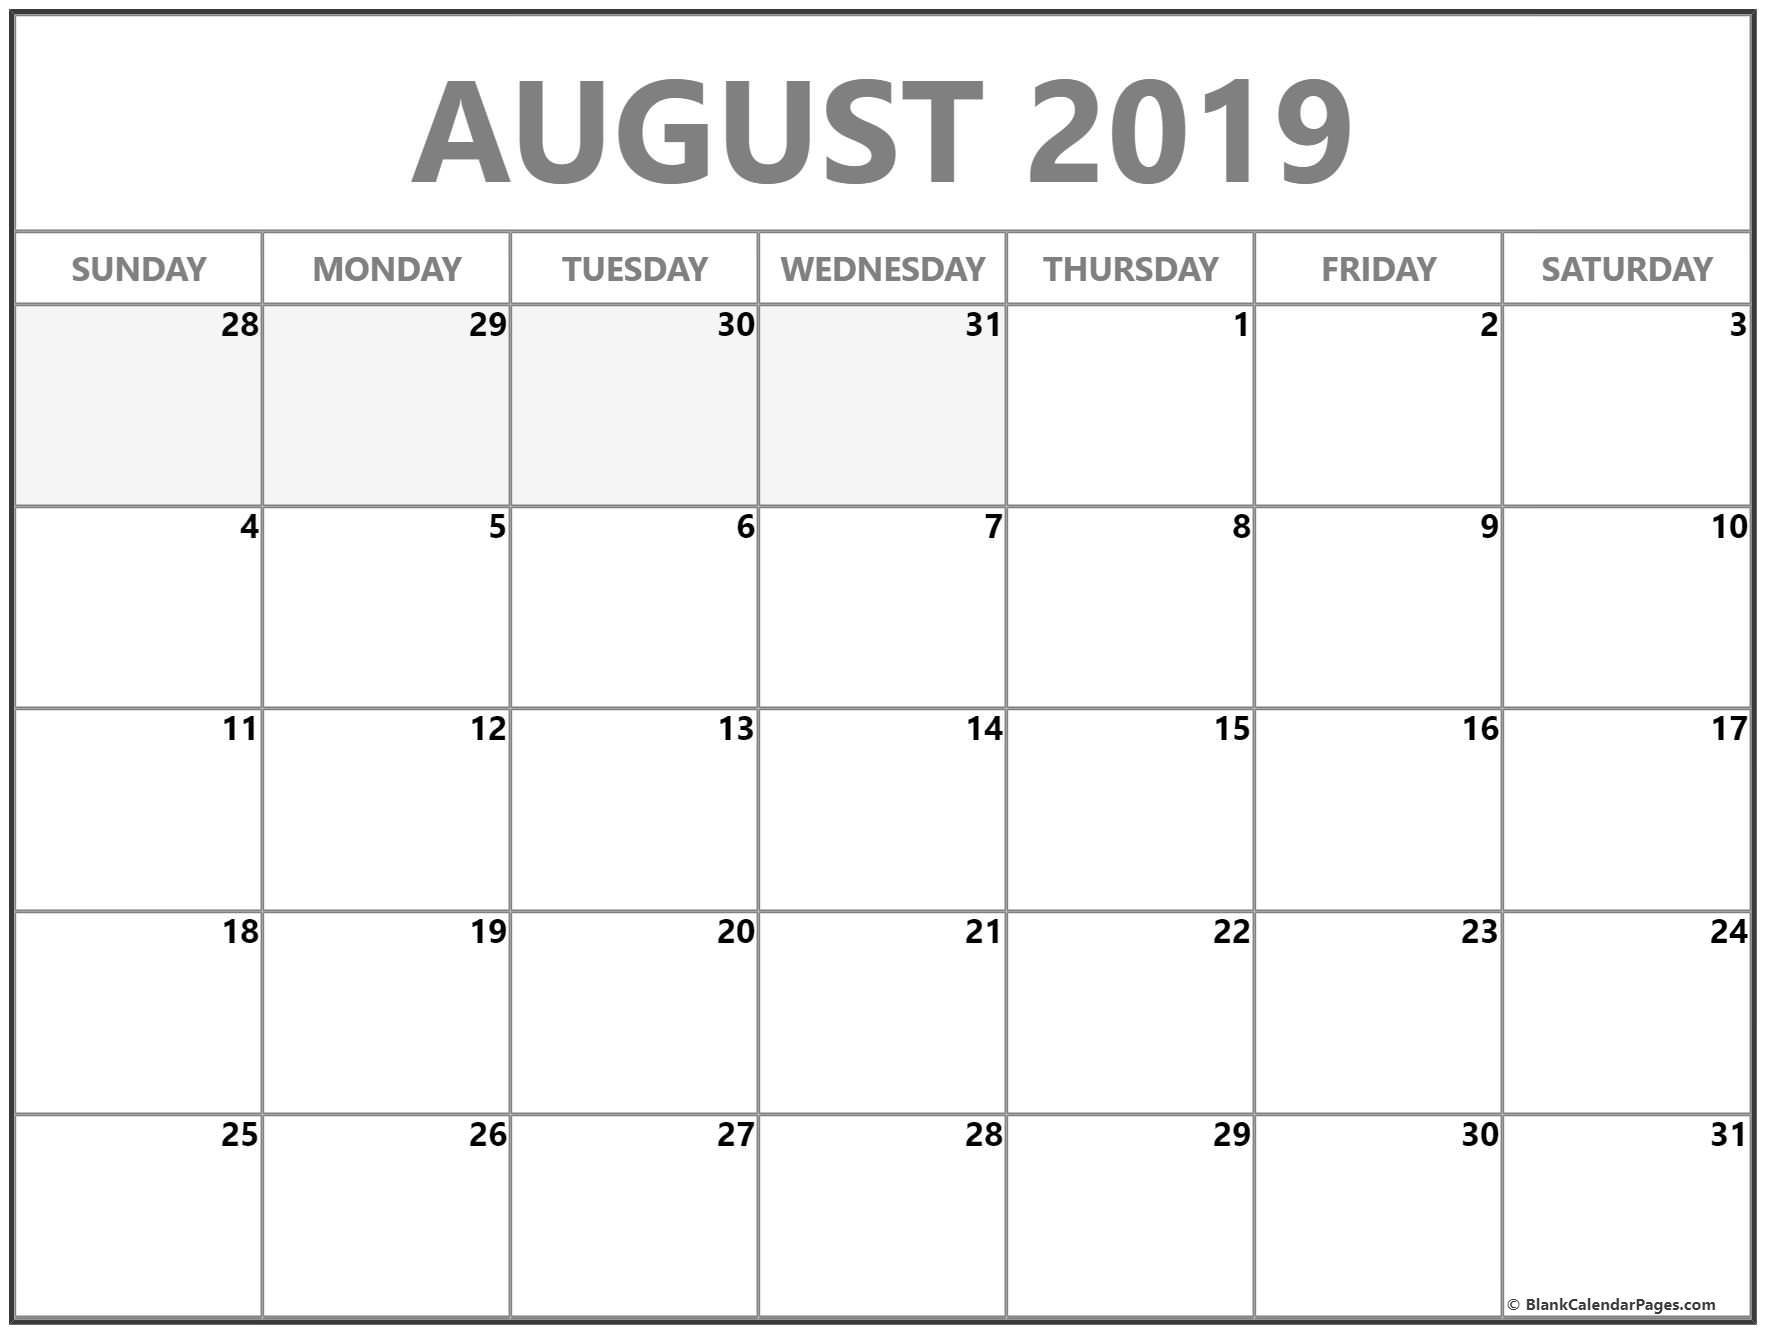 August 2019 Calendar | Free Printable Monthly Calendars-Blank Month Calendar No Weekend